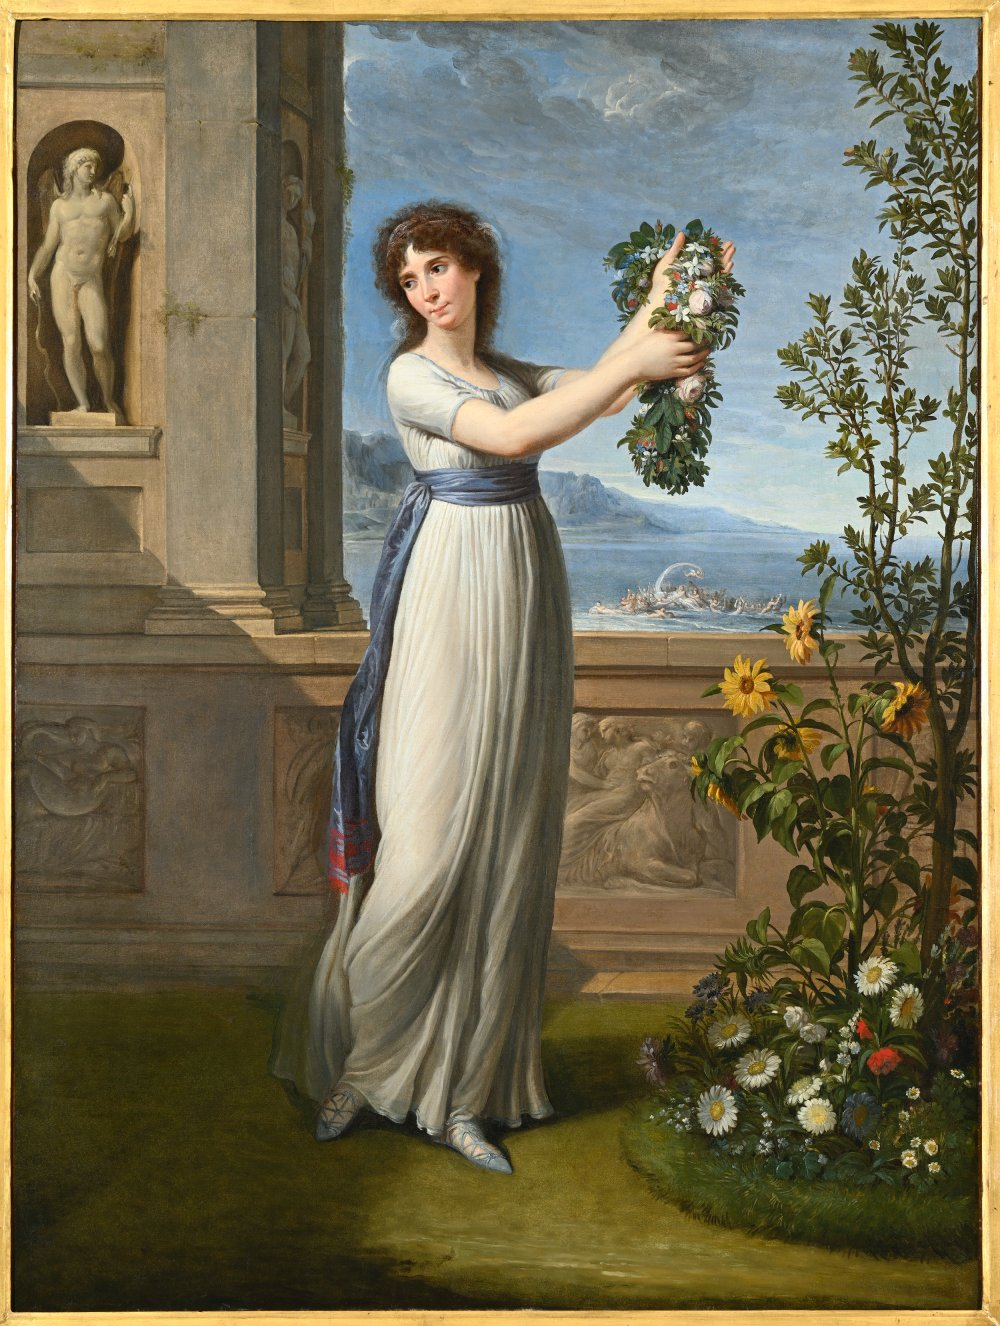 Josephine Bonaparte Crowning the Myrtle Tree